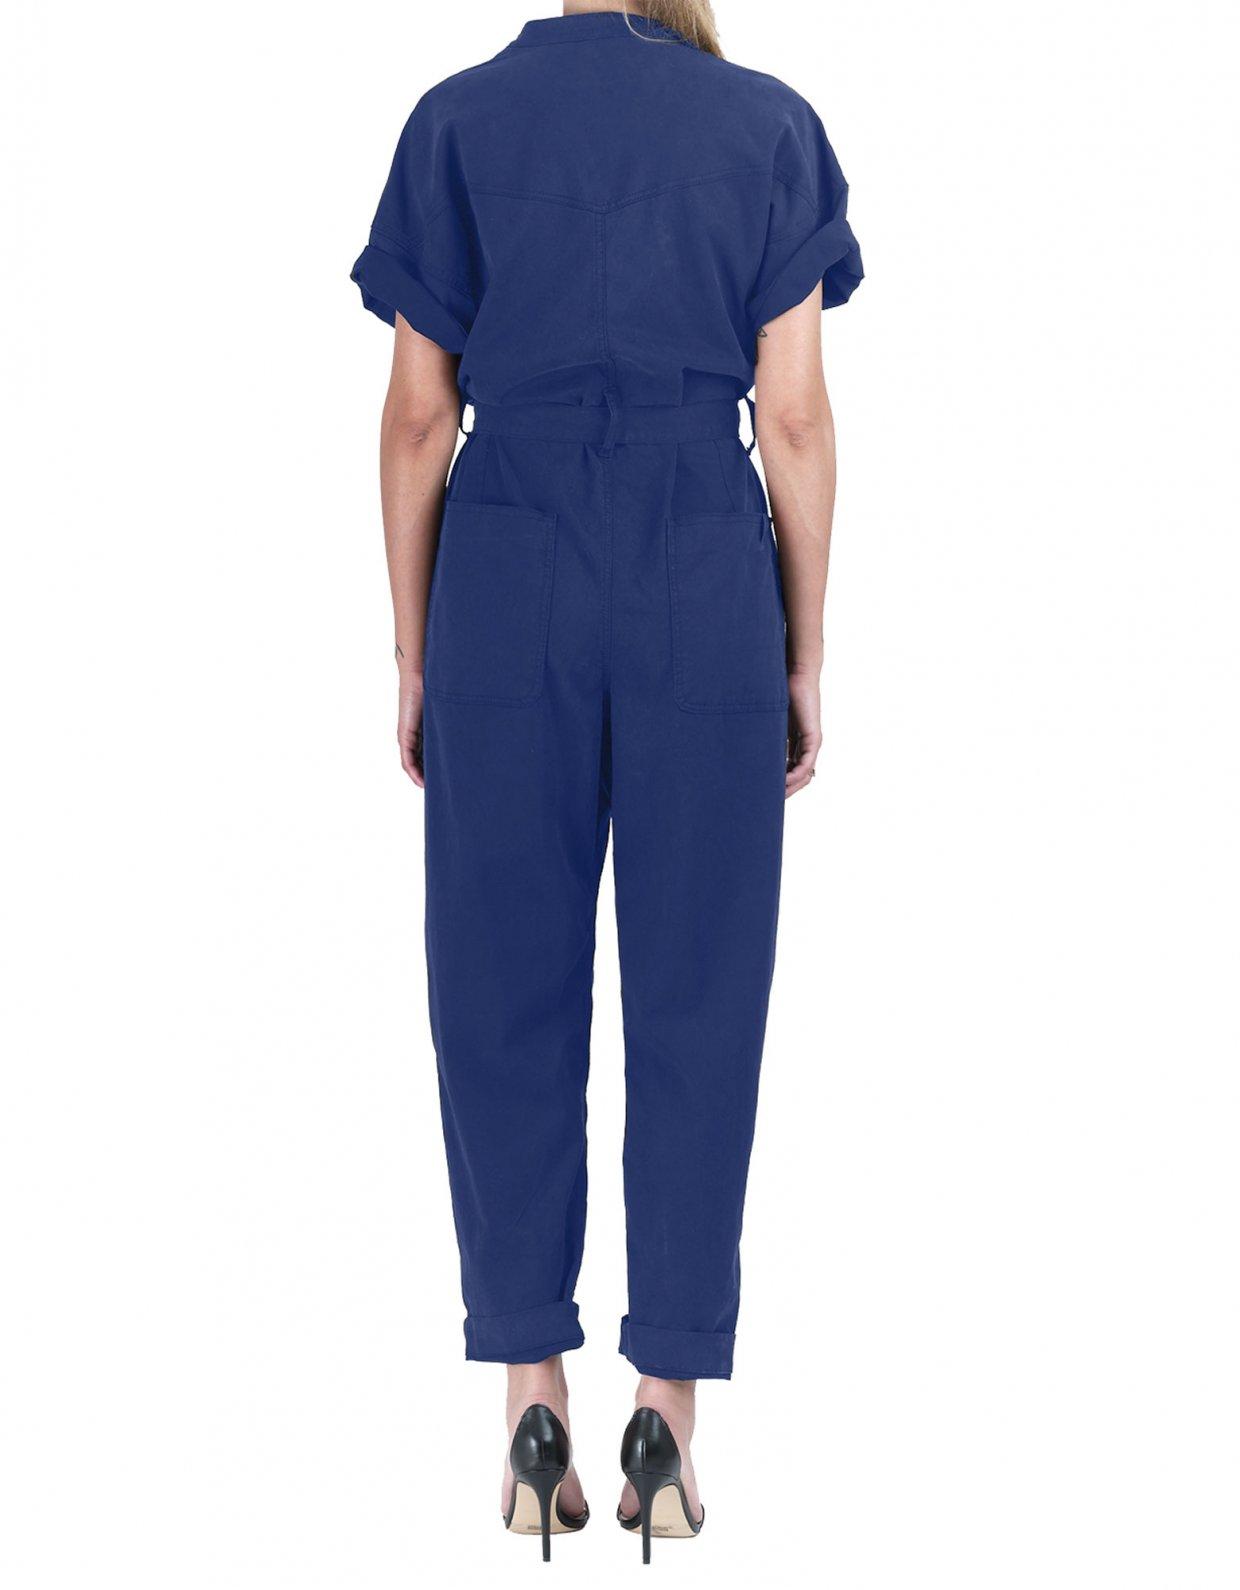 Salt & Pepper Frida nightime blue denim overalls